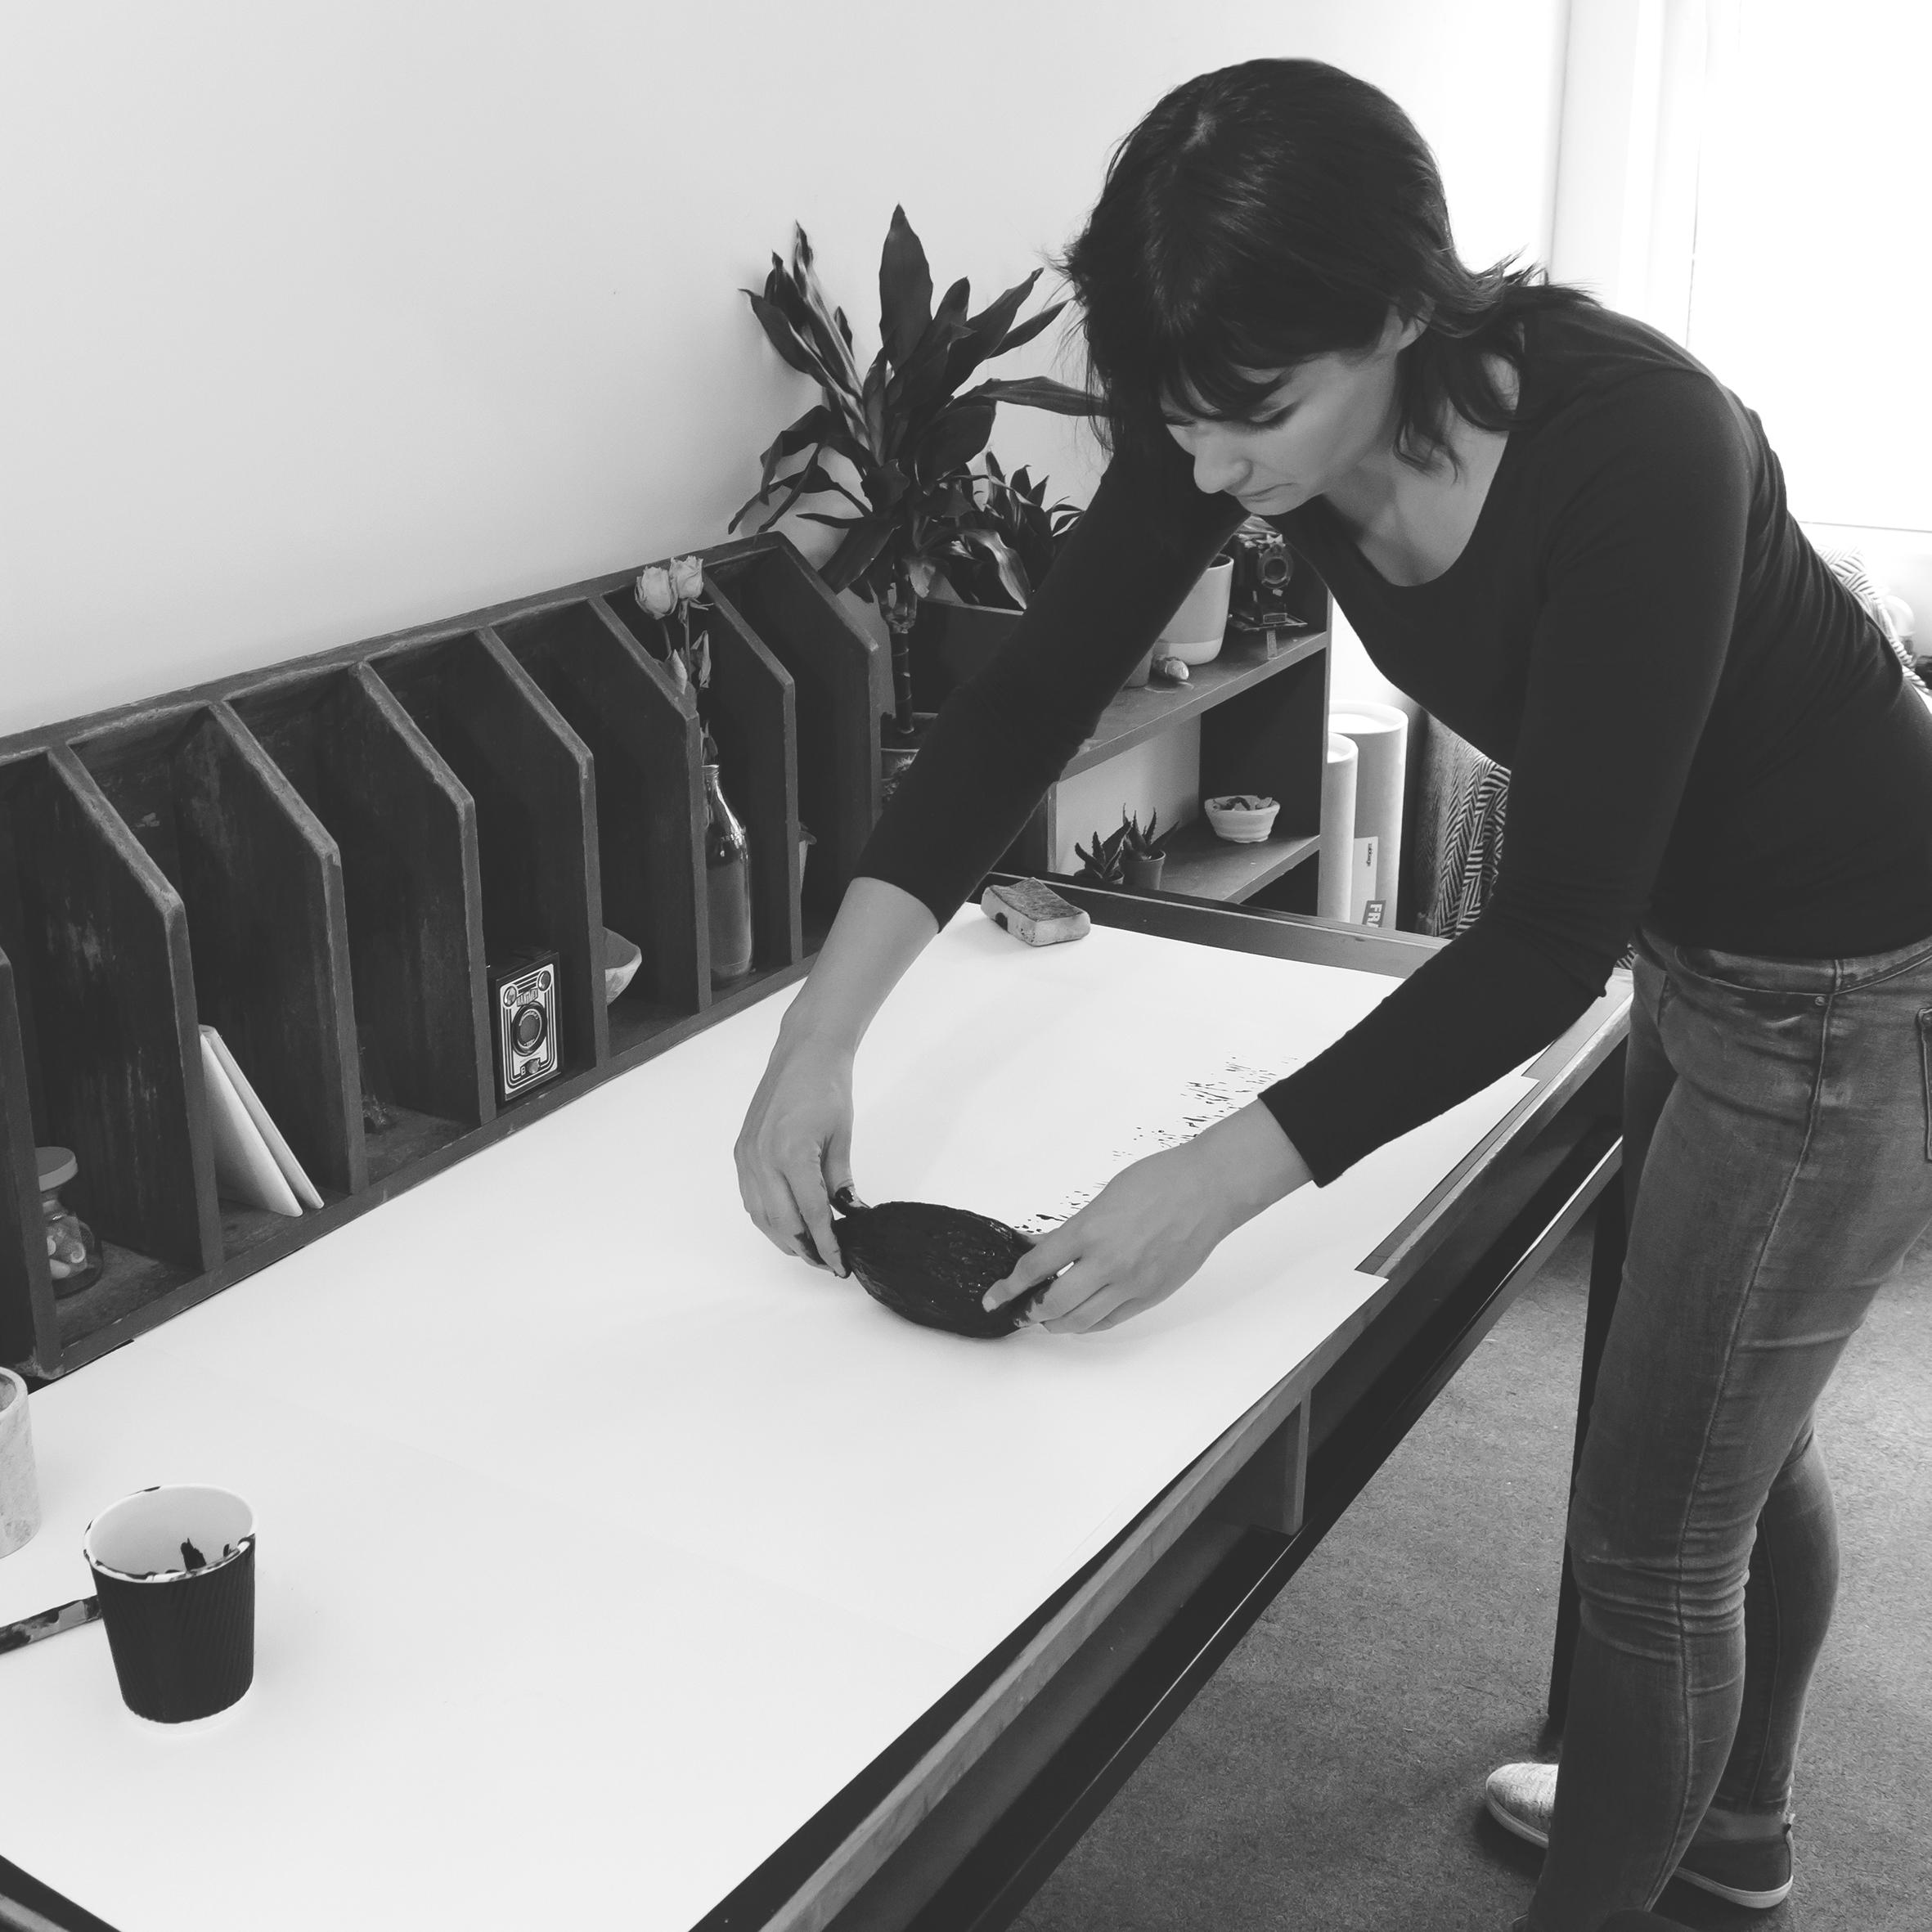 print-making-bts-02.jpg